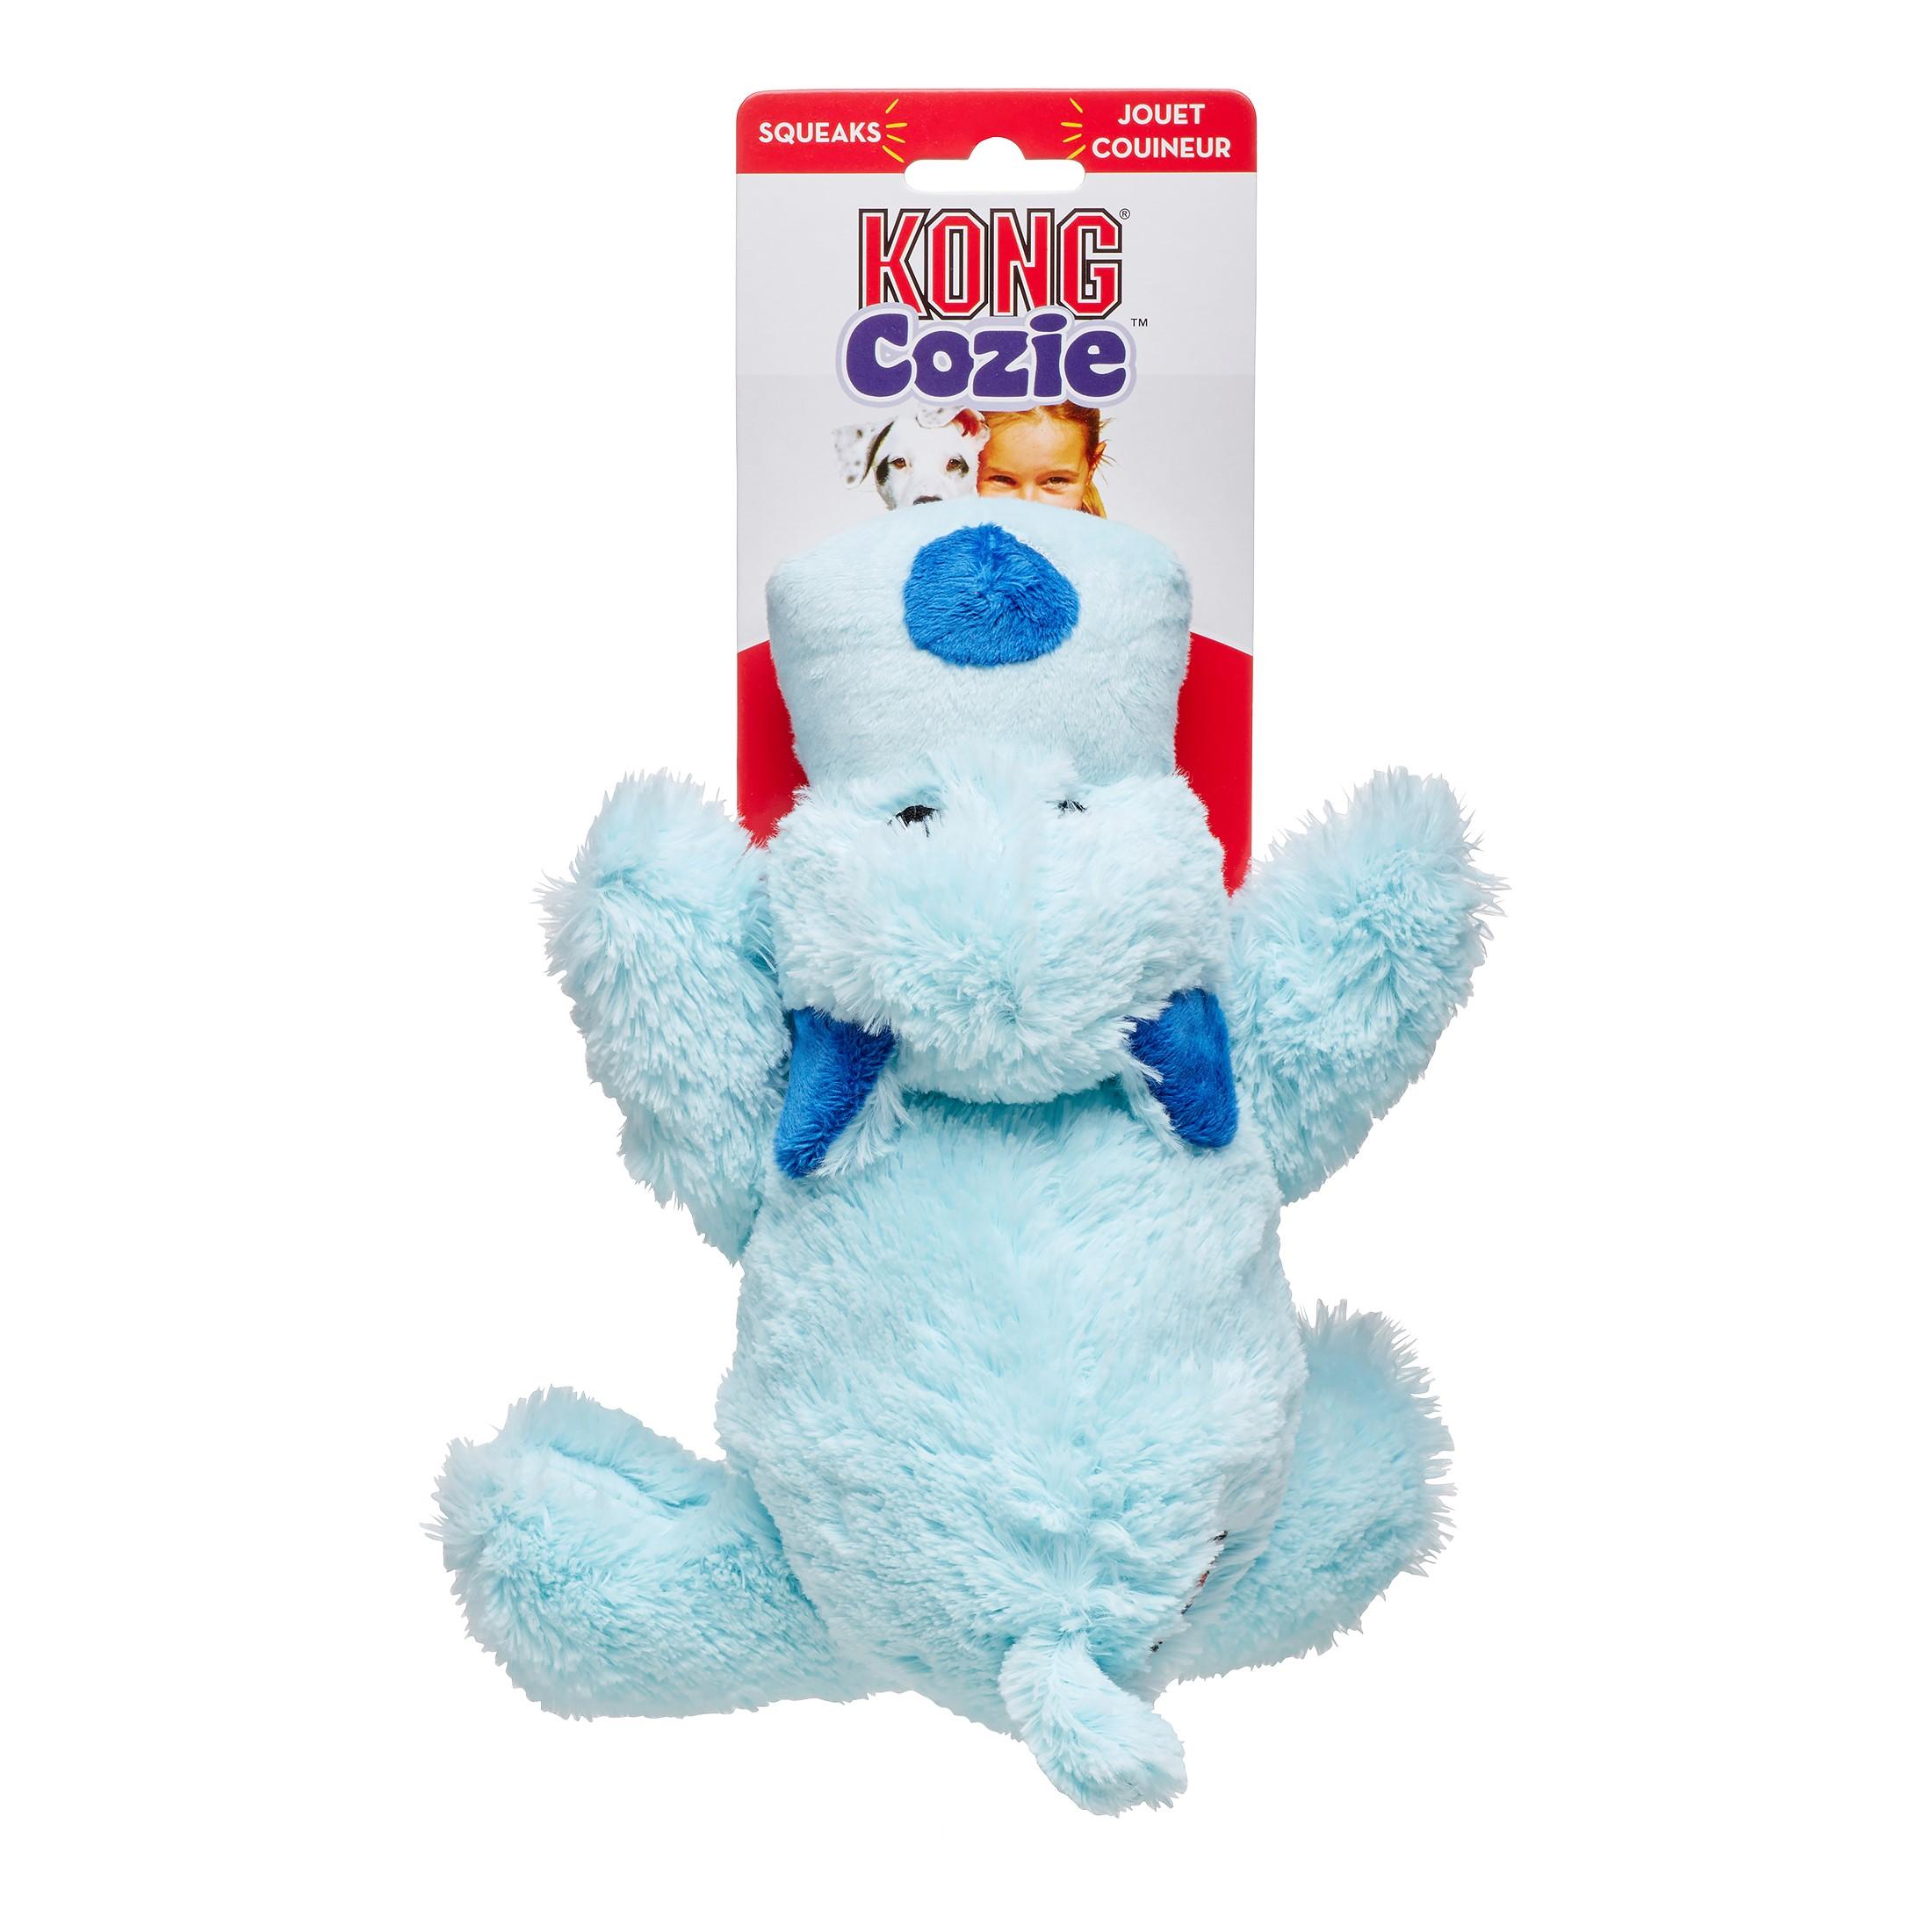 KONG Cozie Baily Dog Toy, Blue, Medium